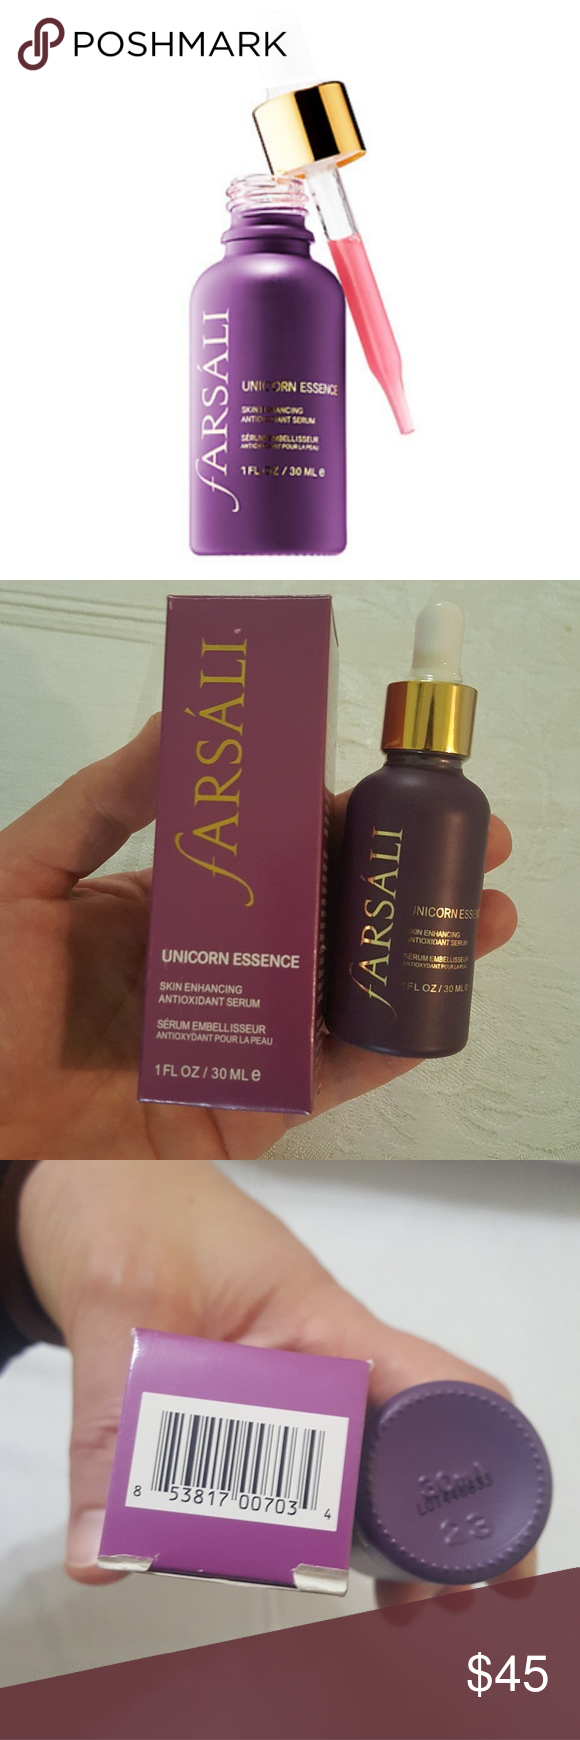 ***SOLD*** Unicorn essence, Sephora makeup, Perfume bottles